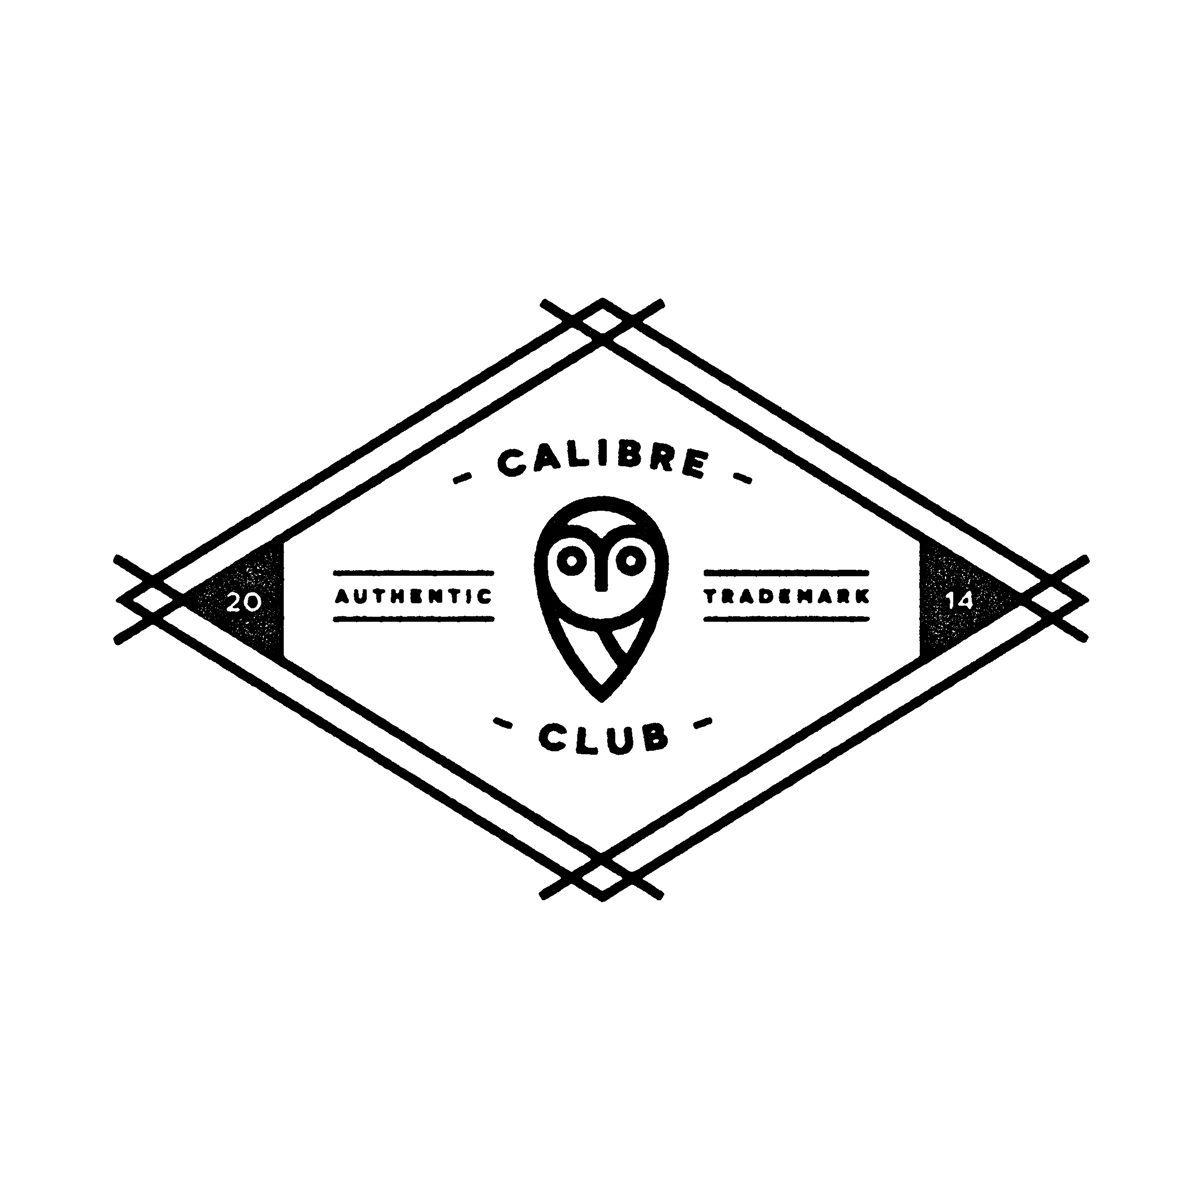 Calibre-Club-Jeremy-Vessey.jpg